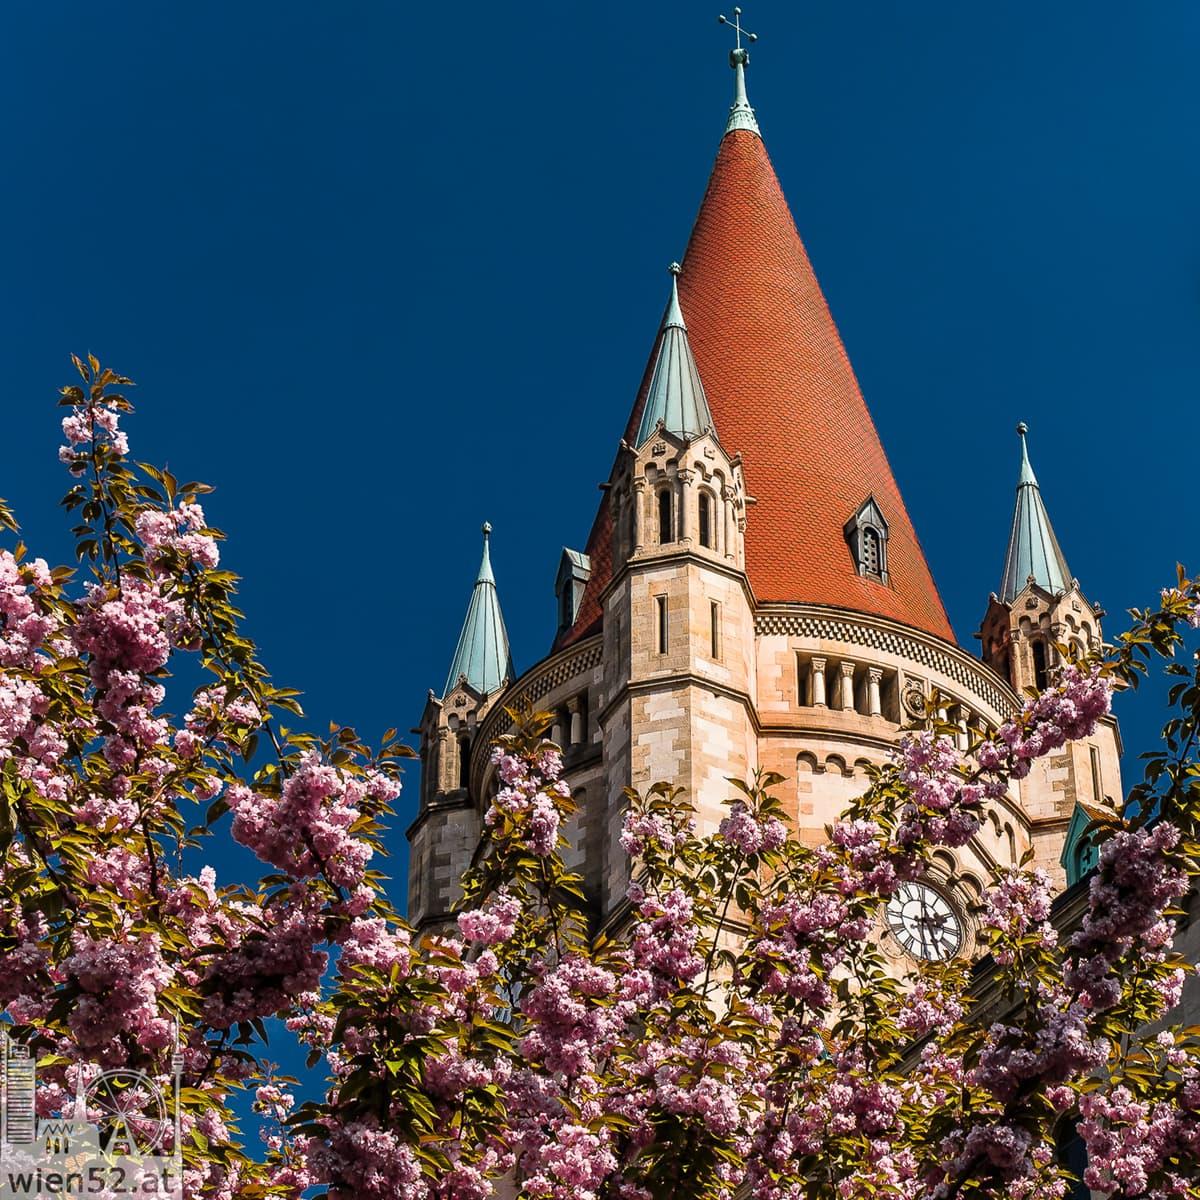 Franz-von-Assisi-Kirche